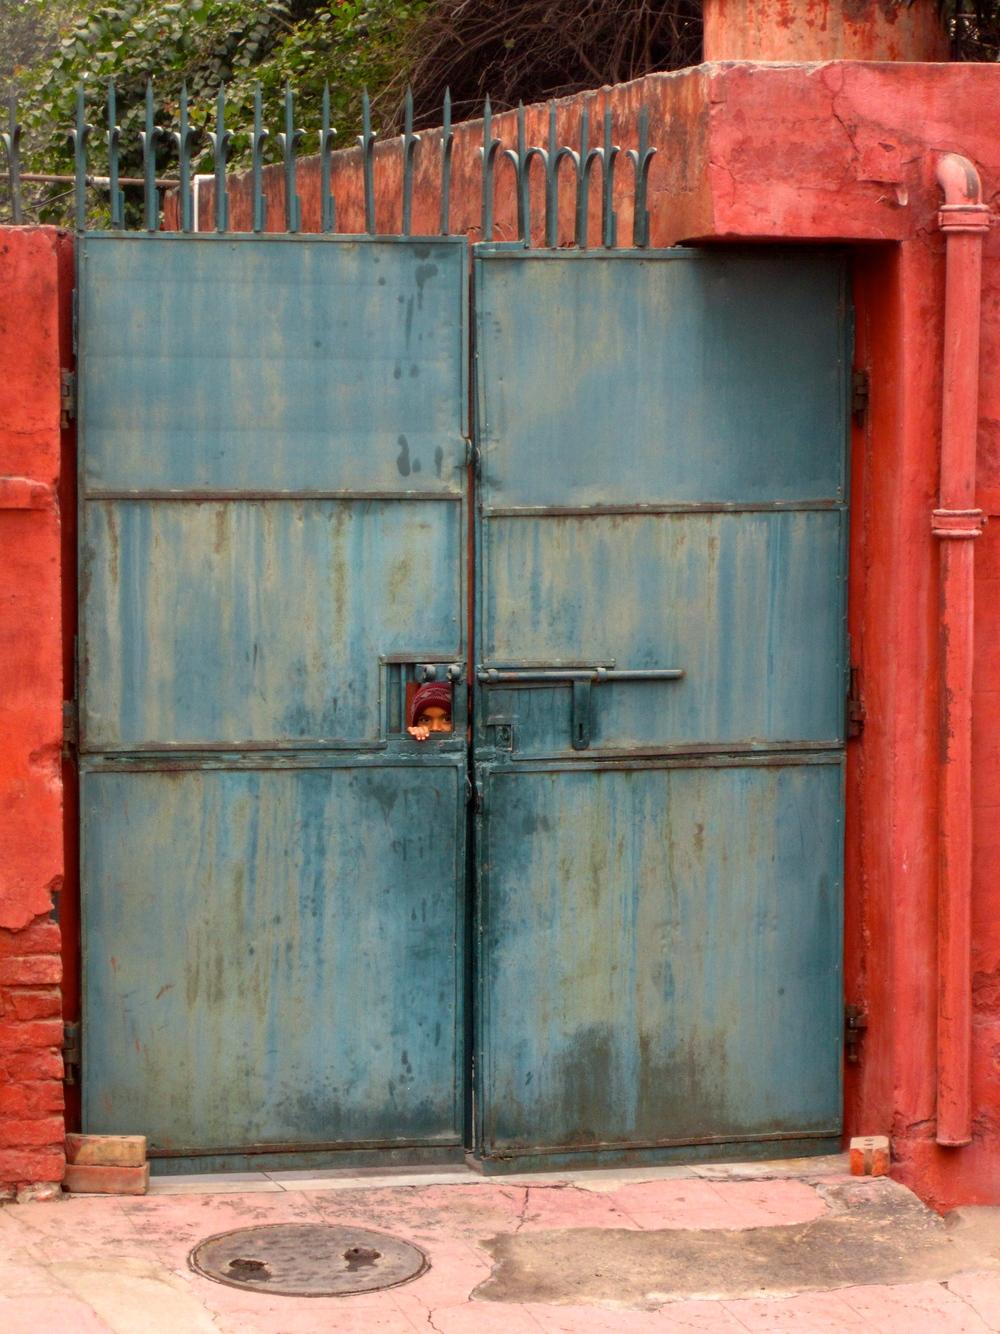 Delhi Agra_30Dec12 (20).JPG